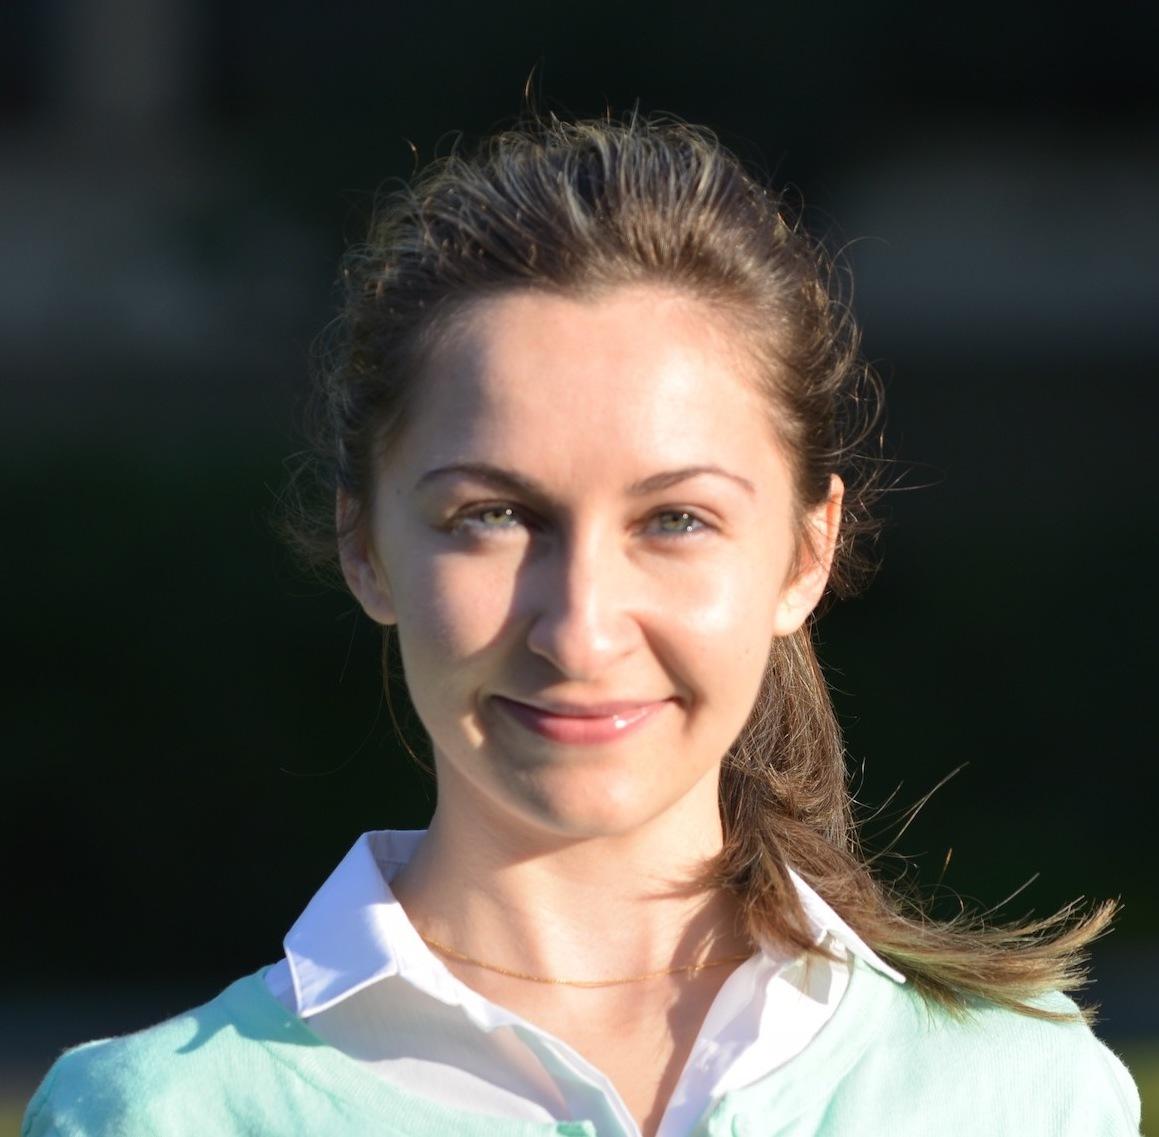 Helena Ronis (allfactors.com/hey)